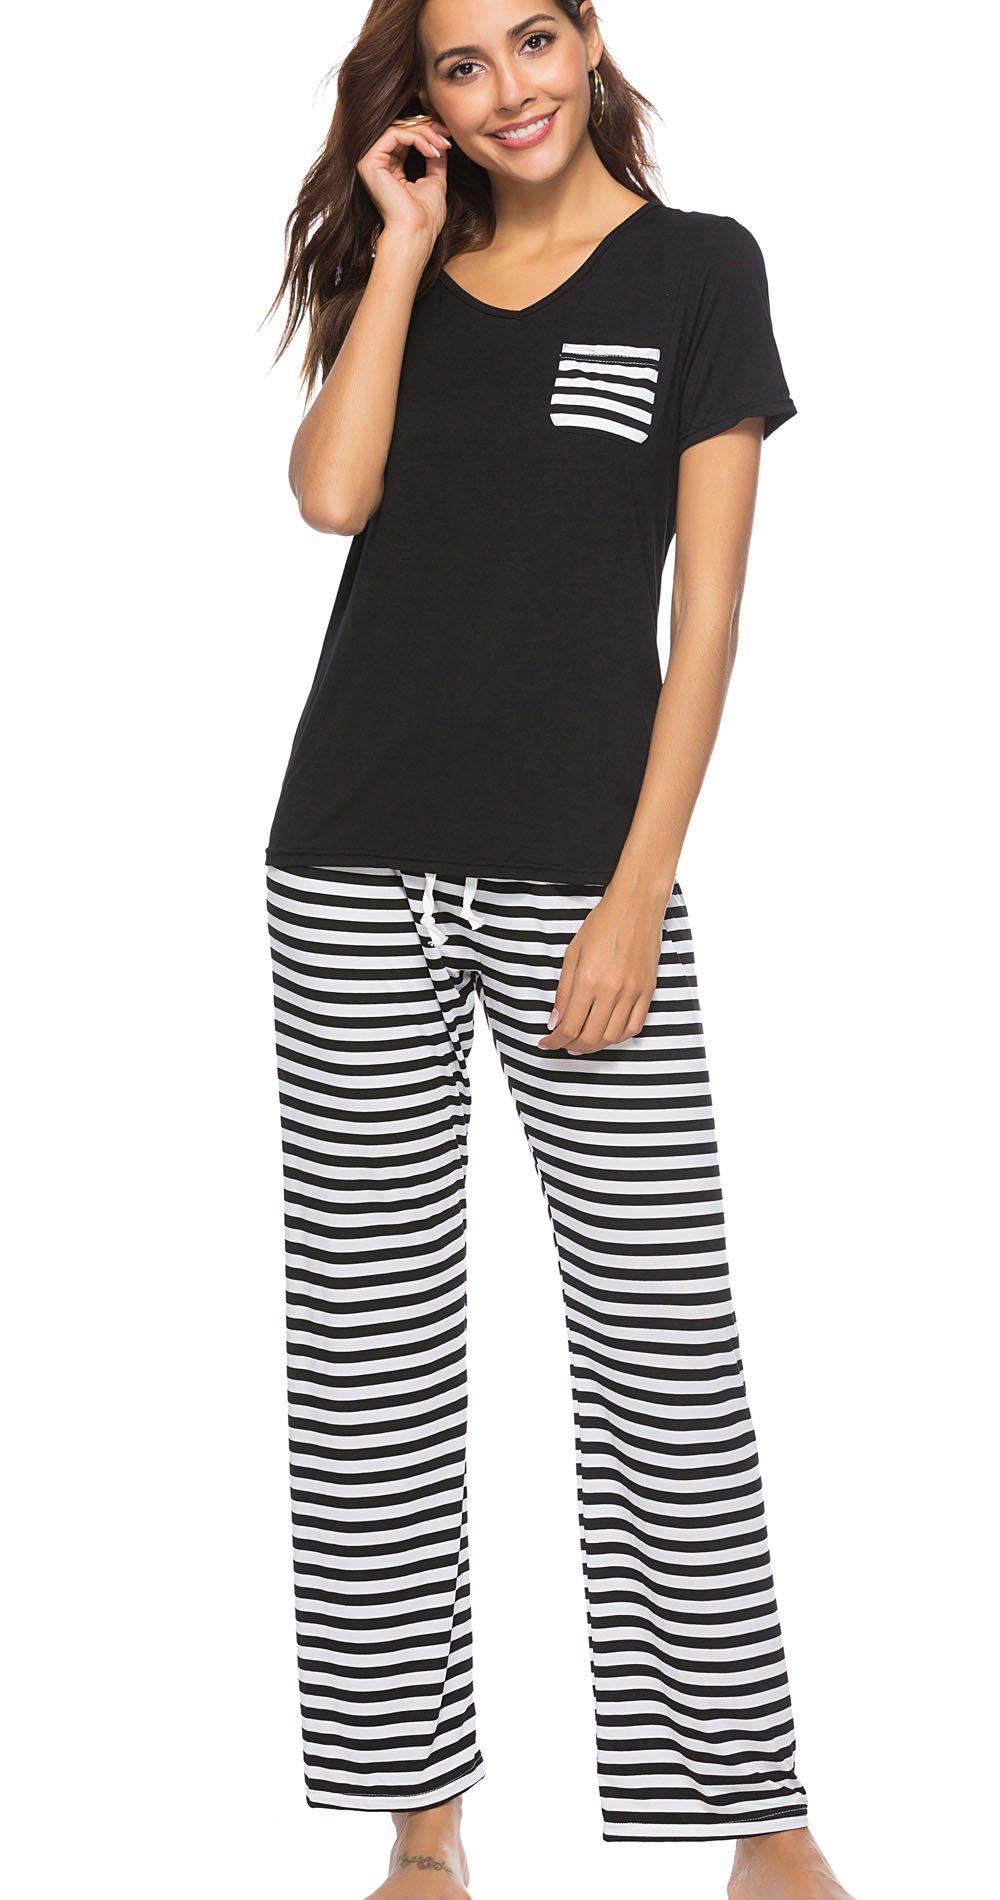 Etosell Womens 2 Piece Pajama Set Short Sleeve Top Striped Pants Lounge Sleepwear Set (X-Large, Black)